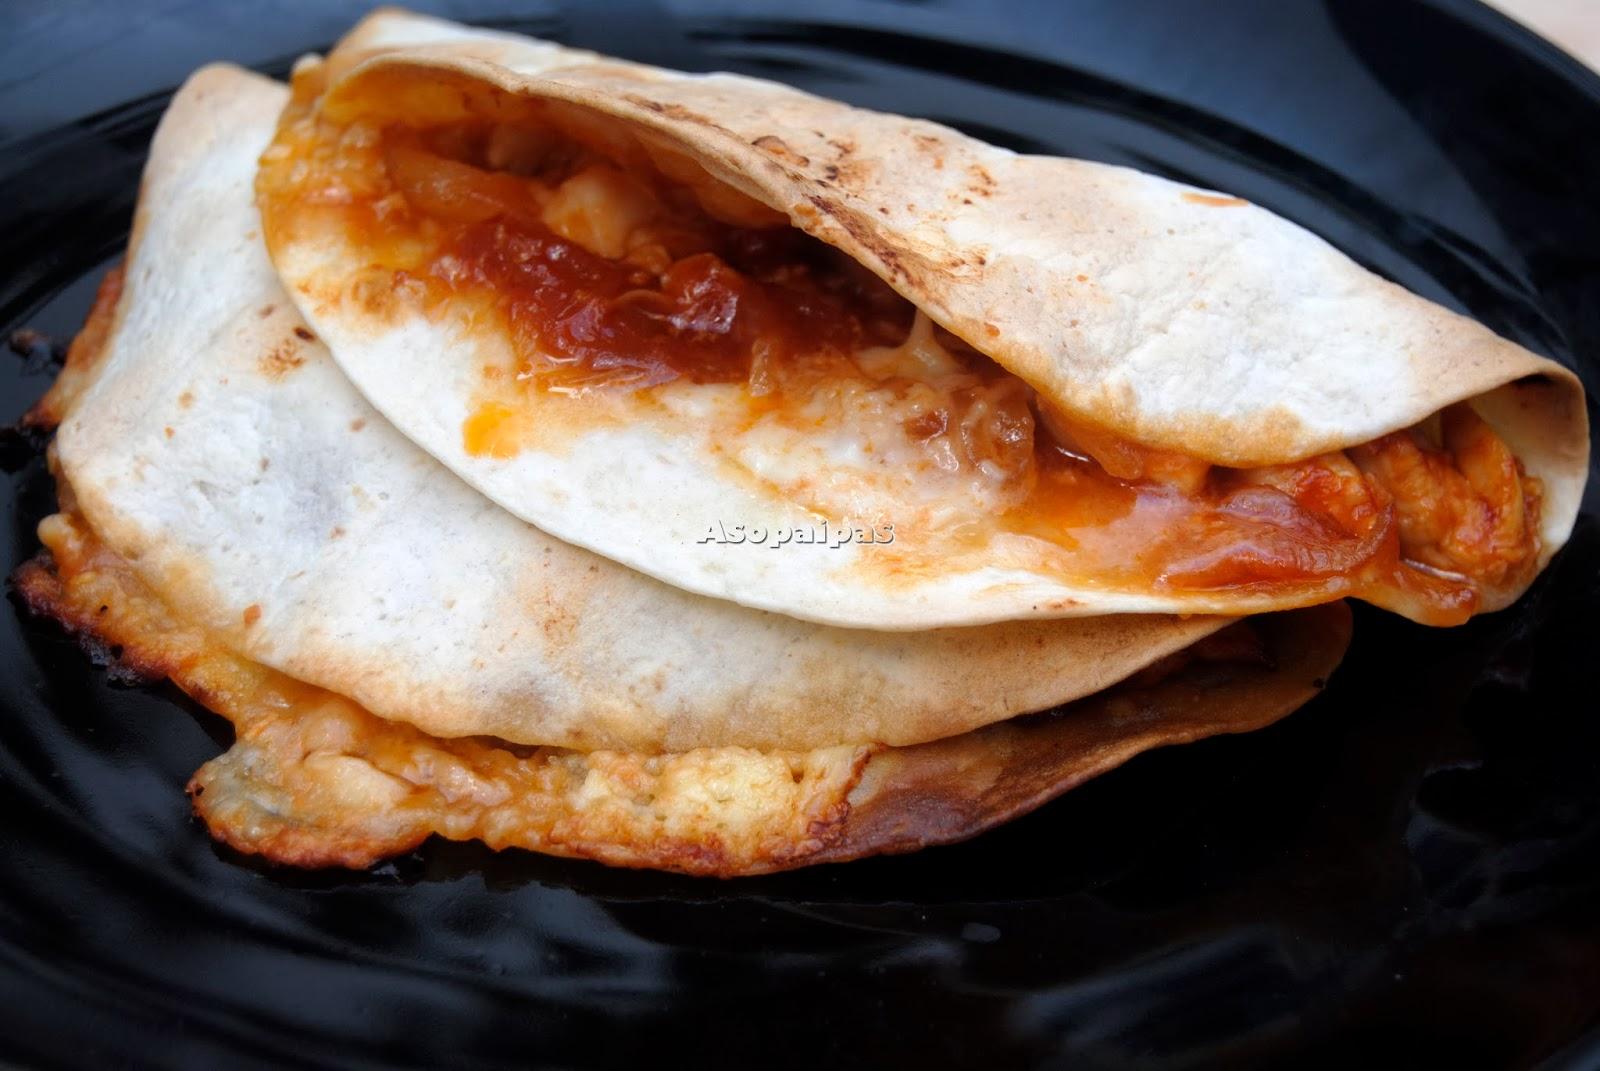 Quesadillas de pollo de texas texas chicken quesadillas for Recetas cocina casera